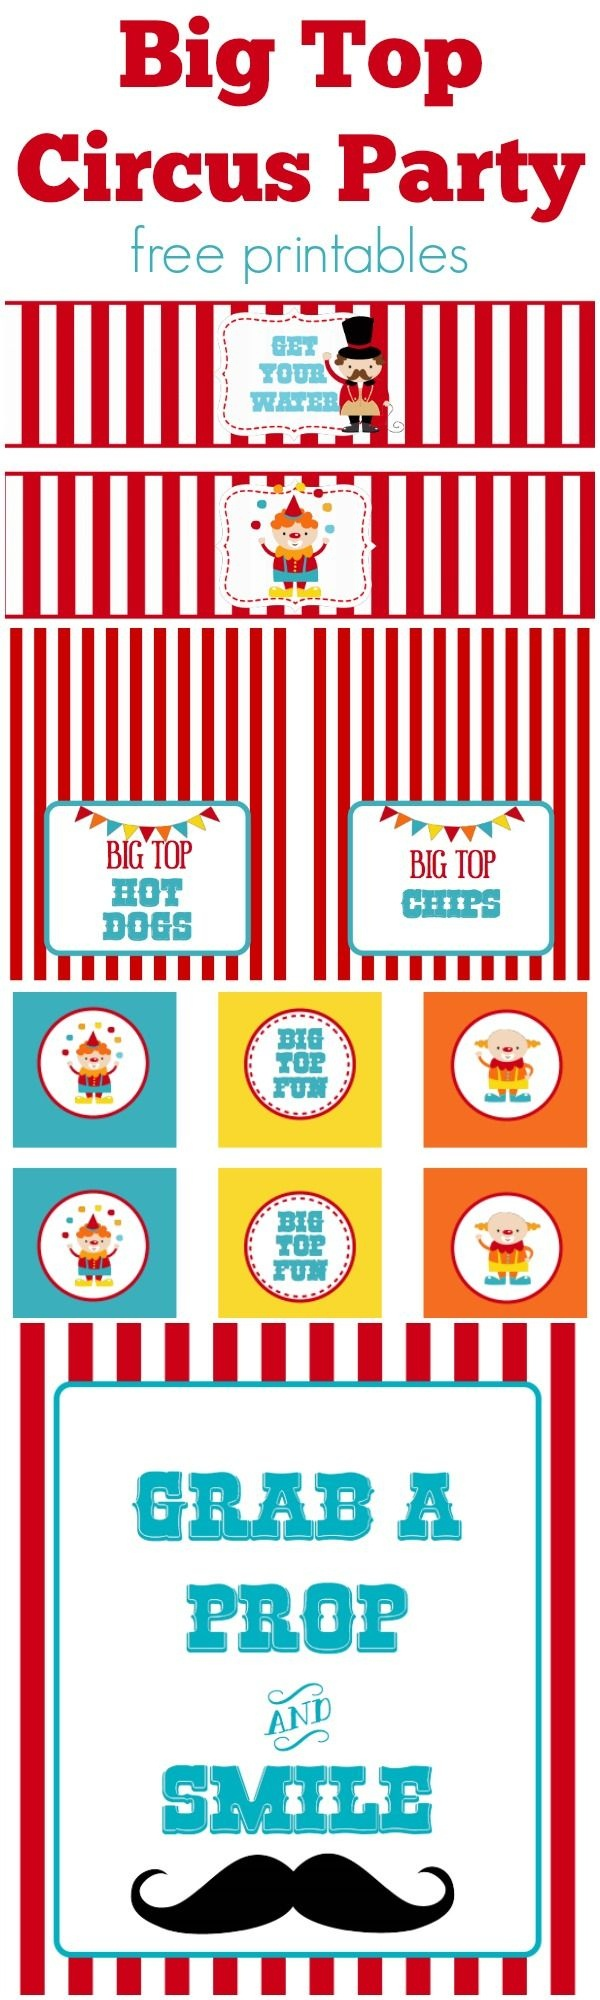 Circus Party   Free Printables   Free Printables   Circus Party - Free Printable Carnival Decorations